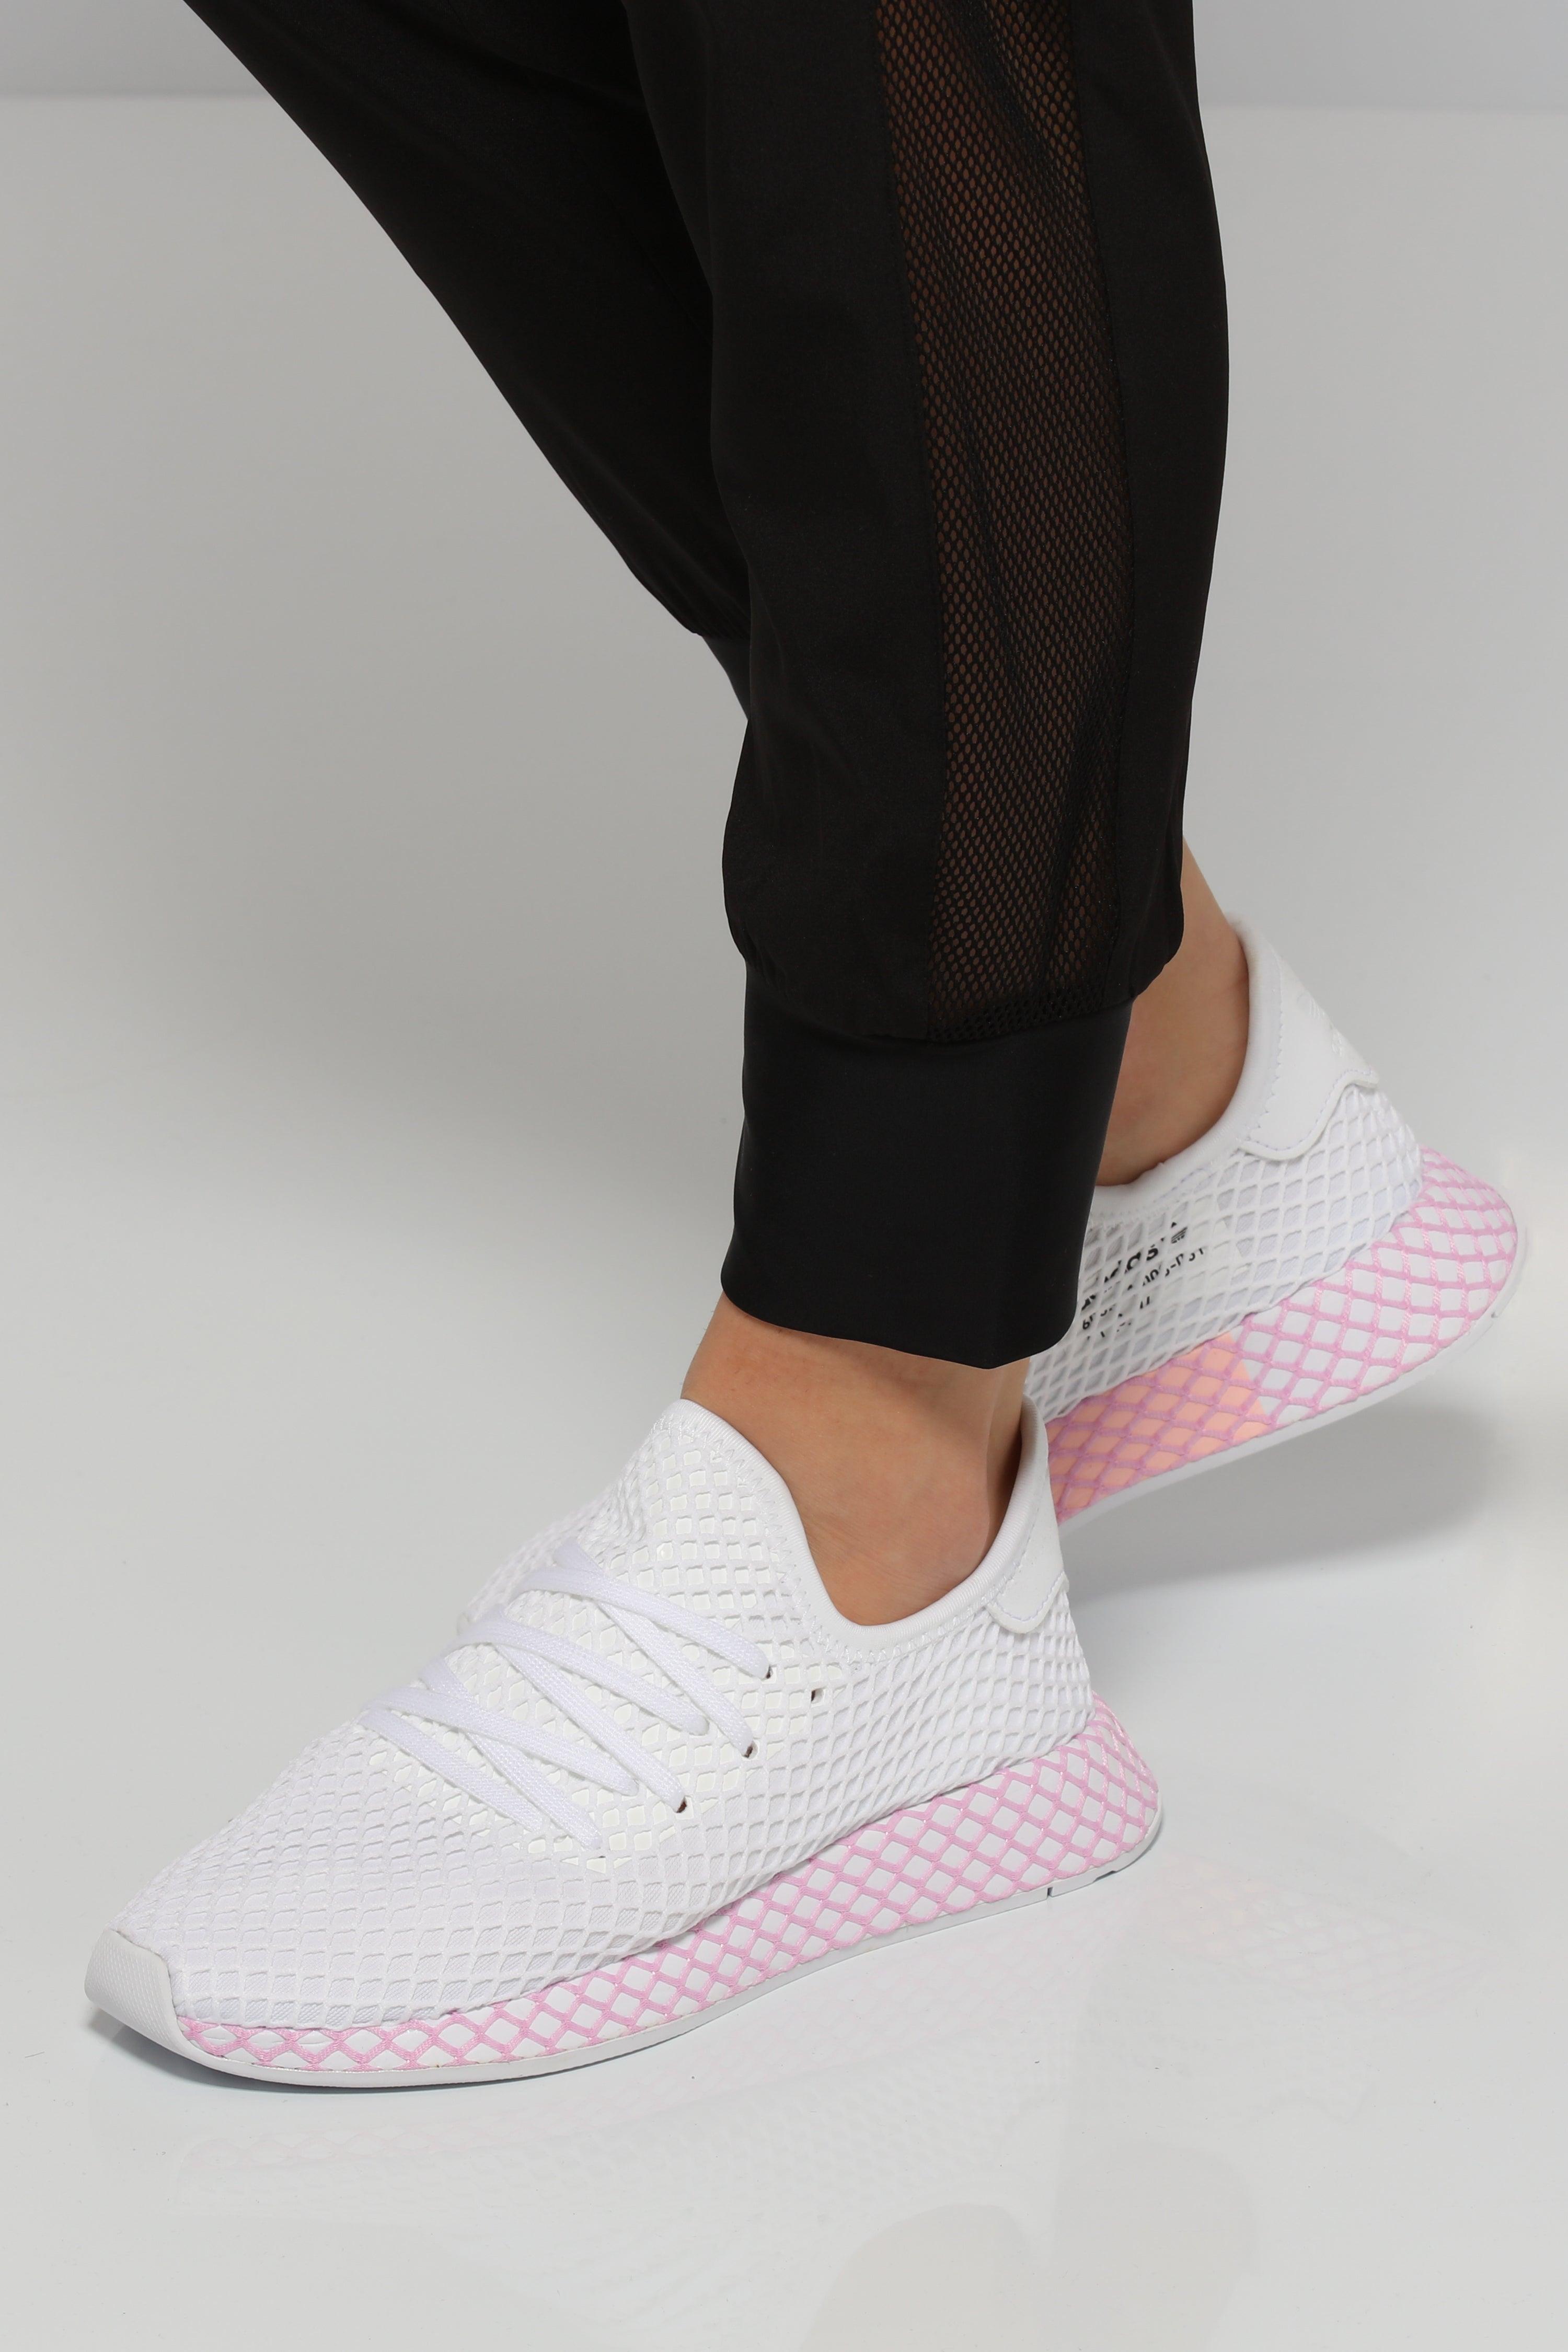 Deerupt Runner White/Pink